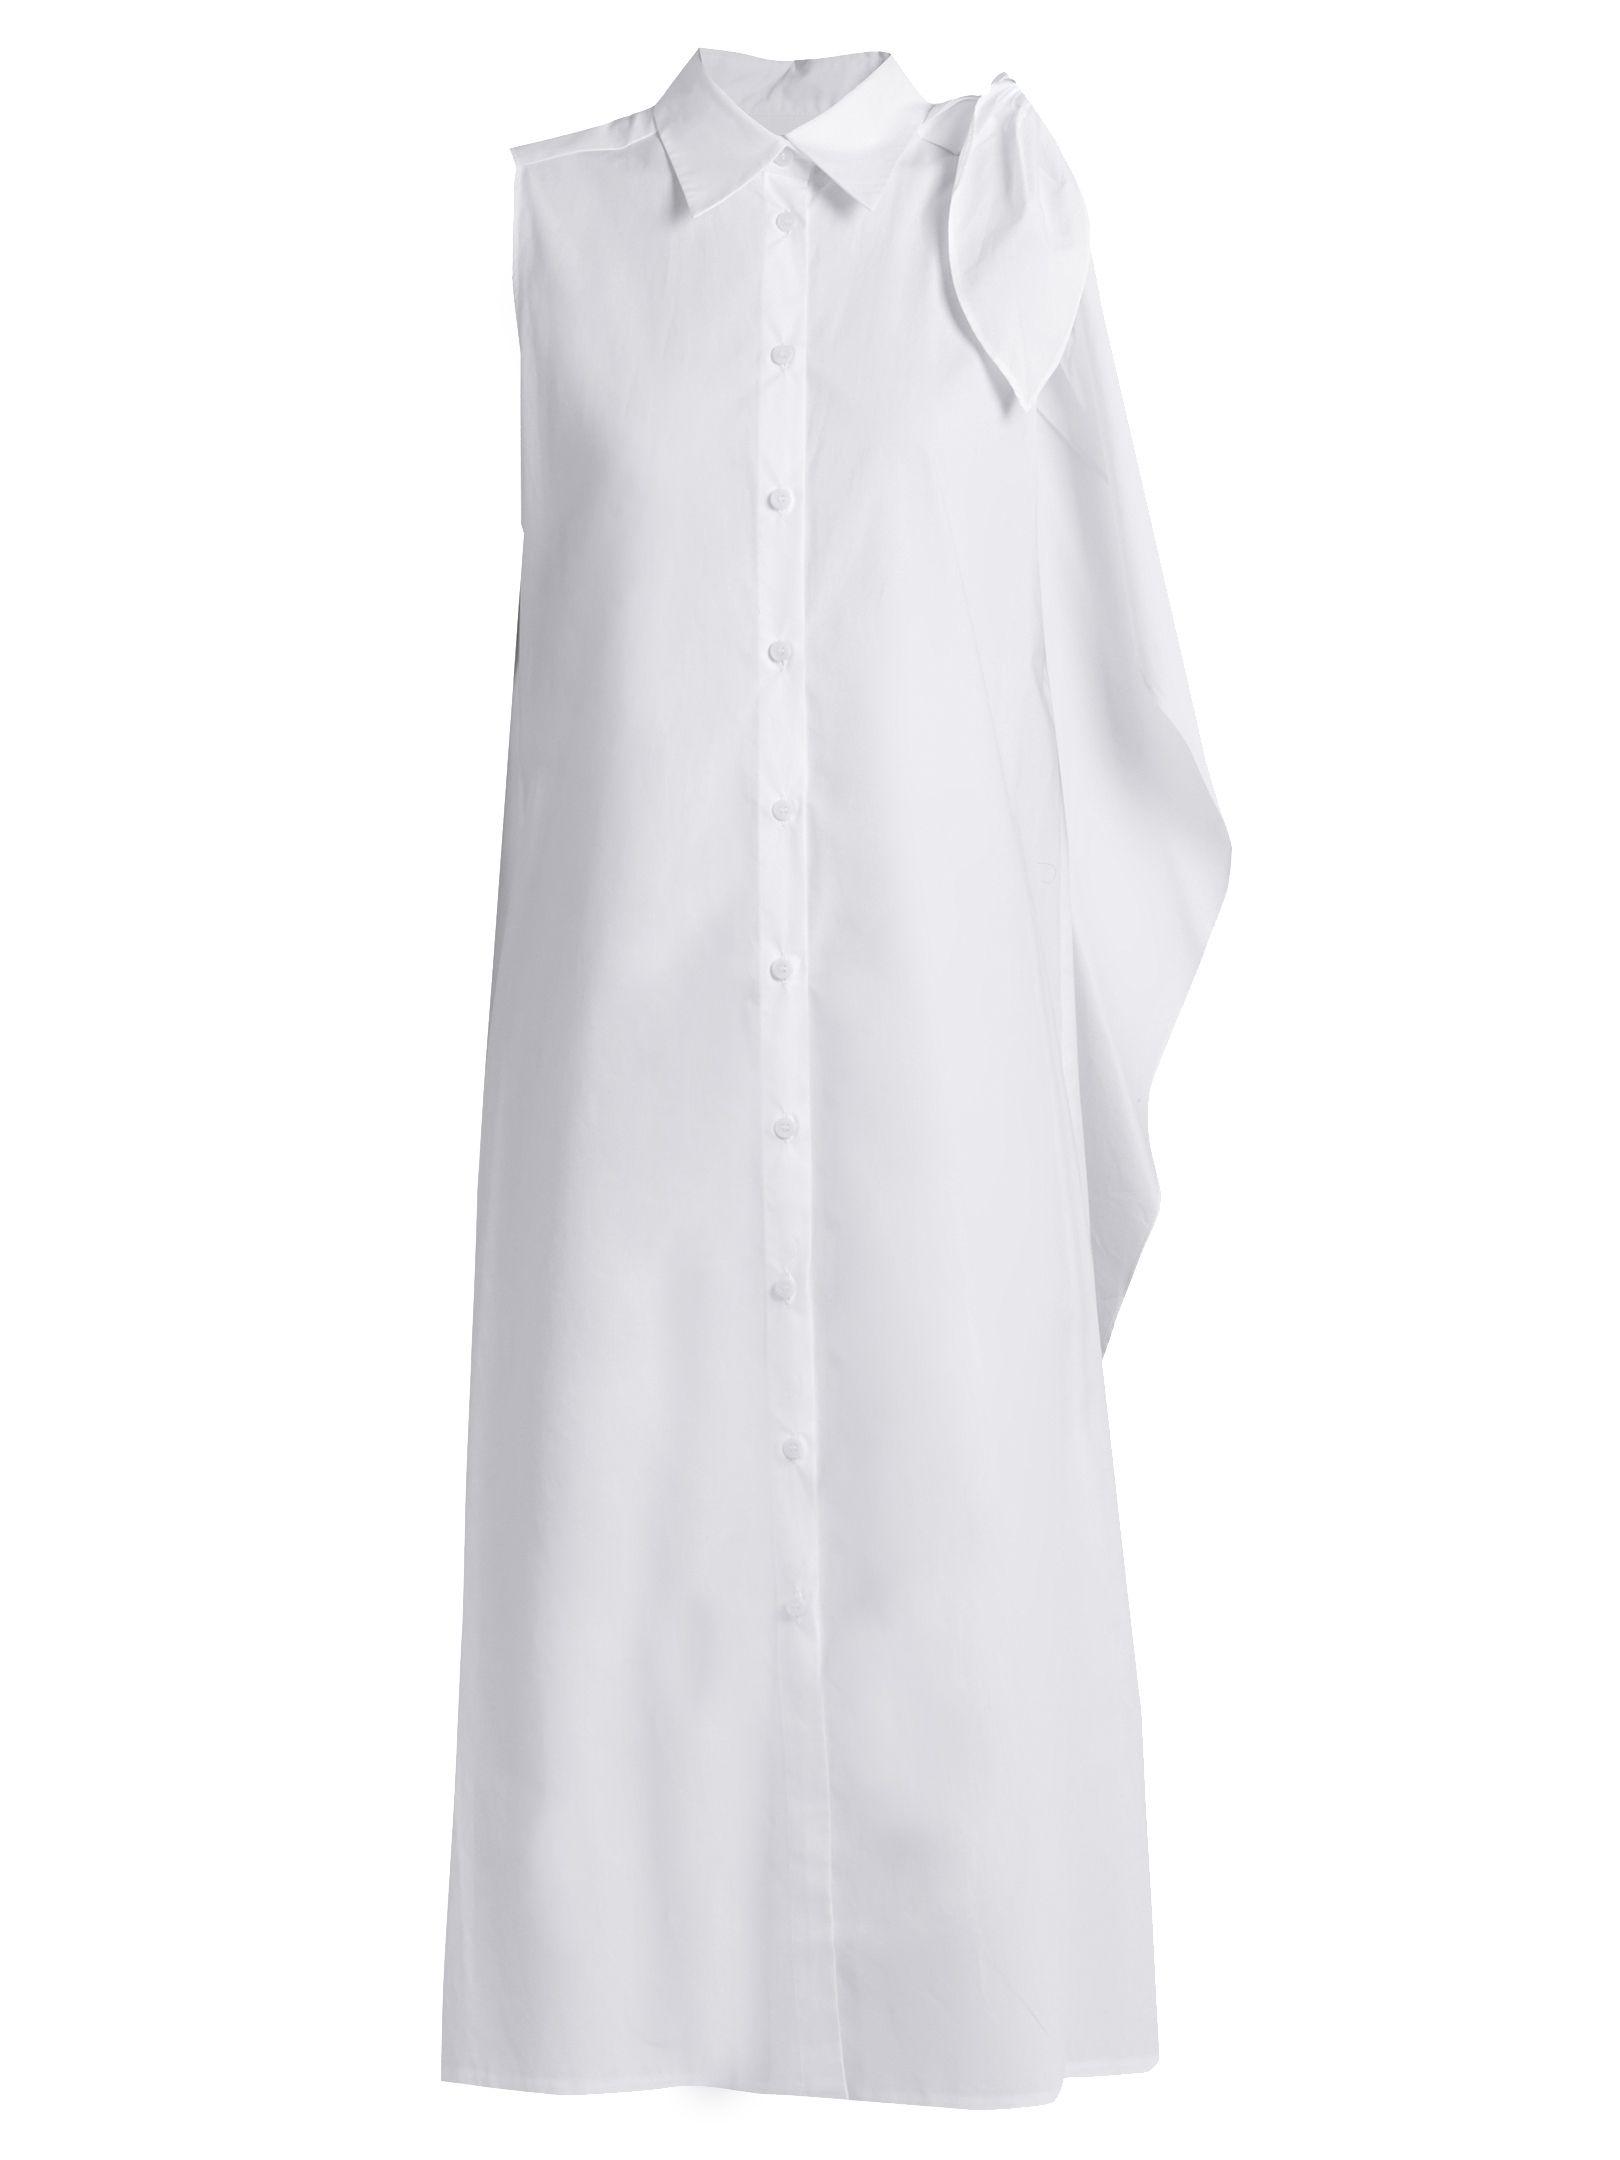 87c088d63b4 Tie-shoulder cotton-poplin shirtdress | MM6 by Maison Margiela |  MATCHESFASHION.COM